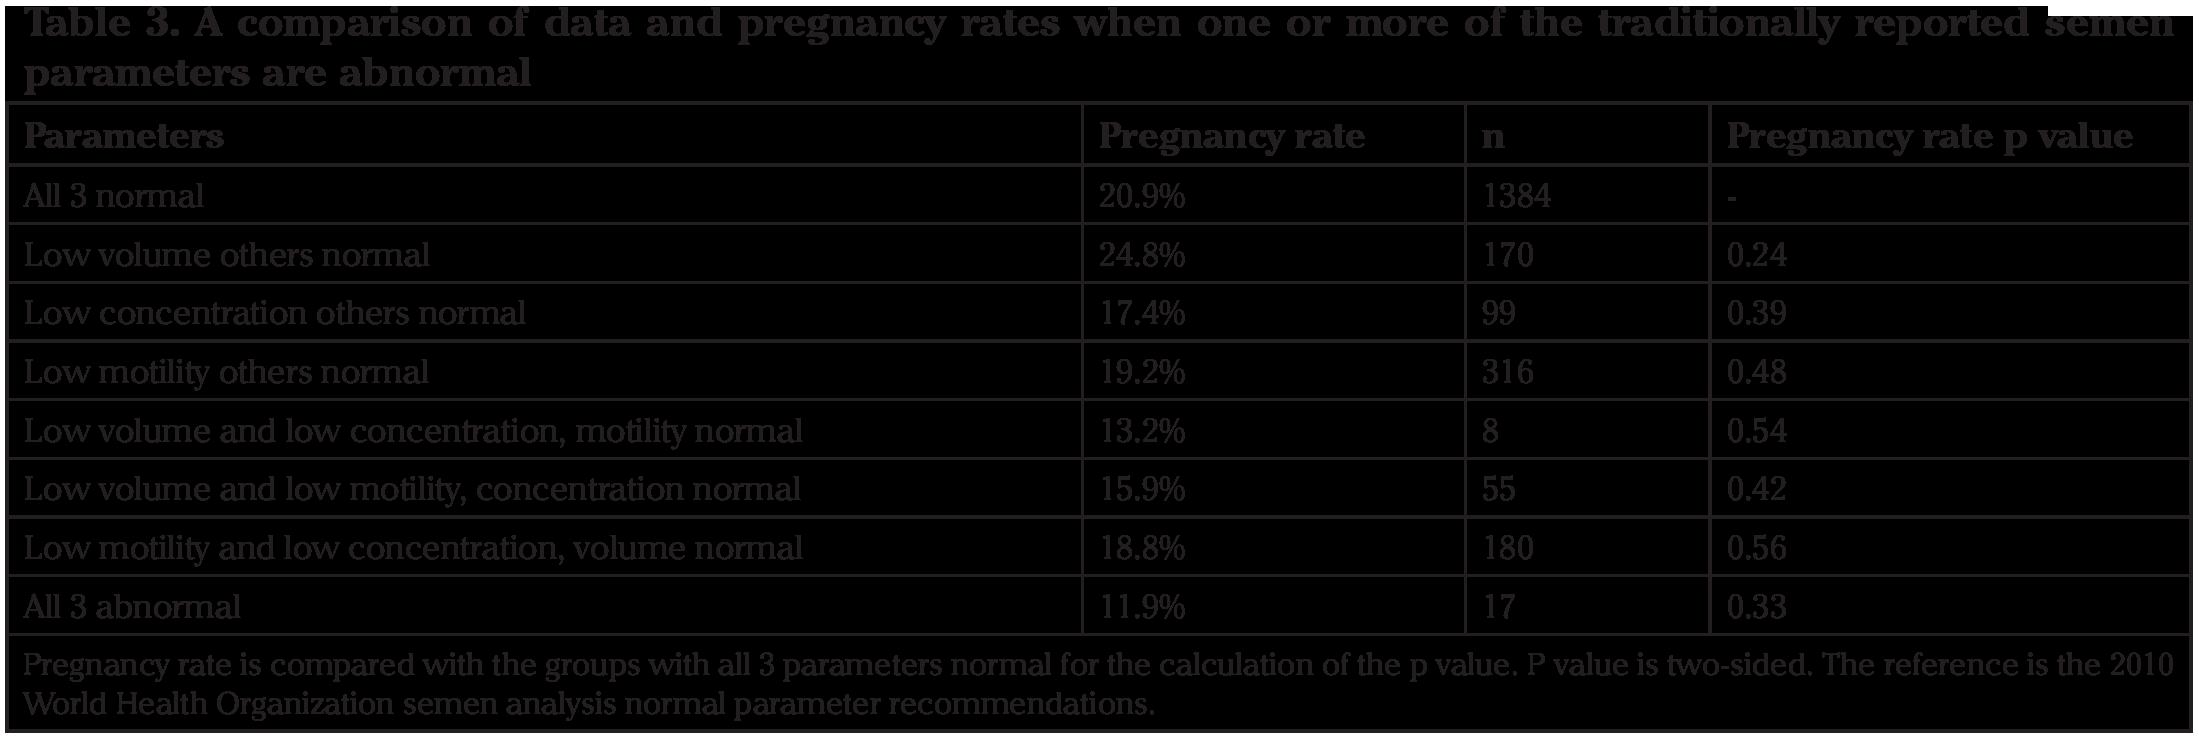 Journal of the Turkish-German Gynecological Association